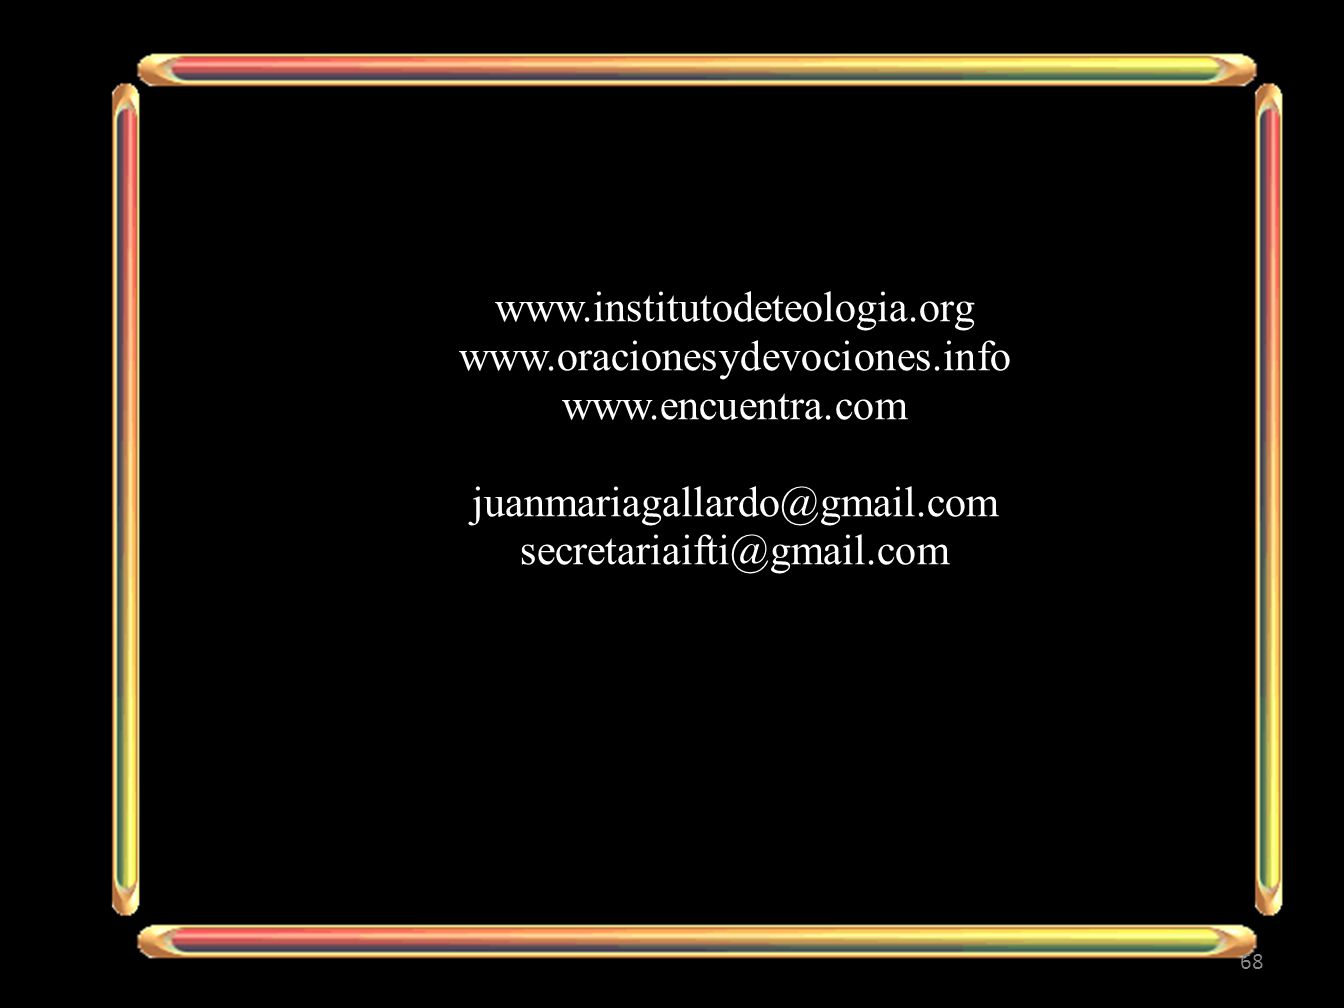 www.institutodeteologia.org www.oracionesydevociones.info www.encuentra.com juanmariagallardo@gmail.com secretariaifti@gmail.com 68